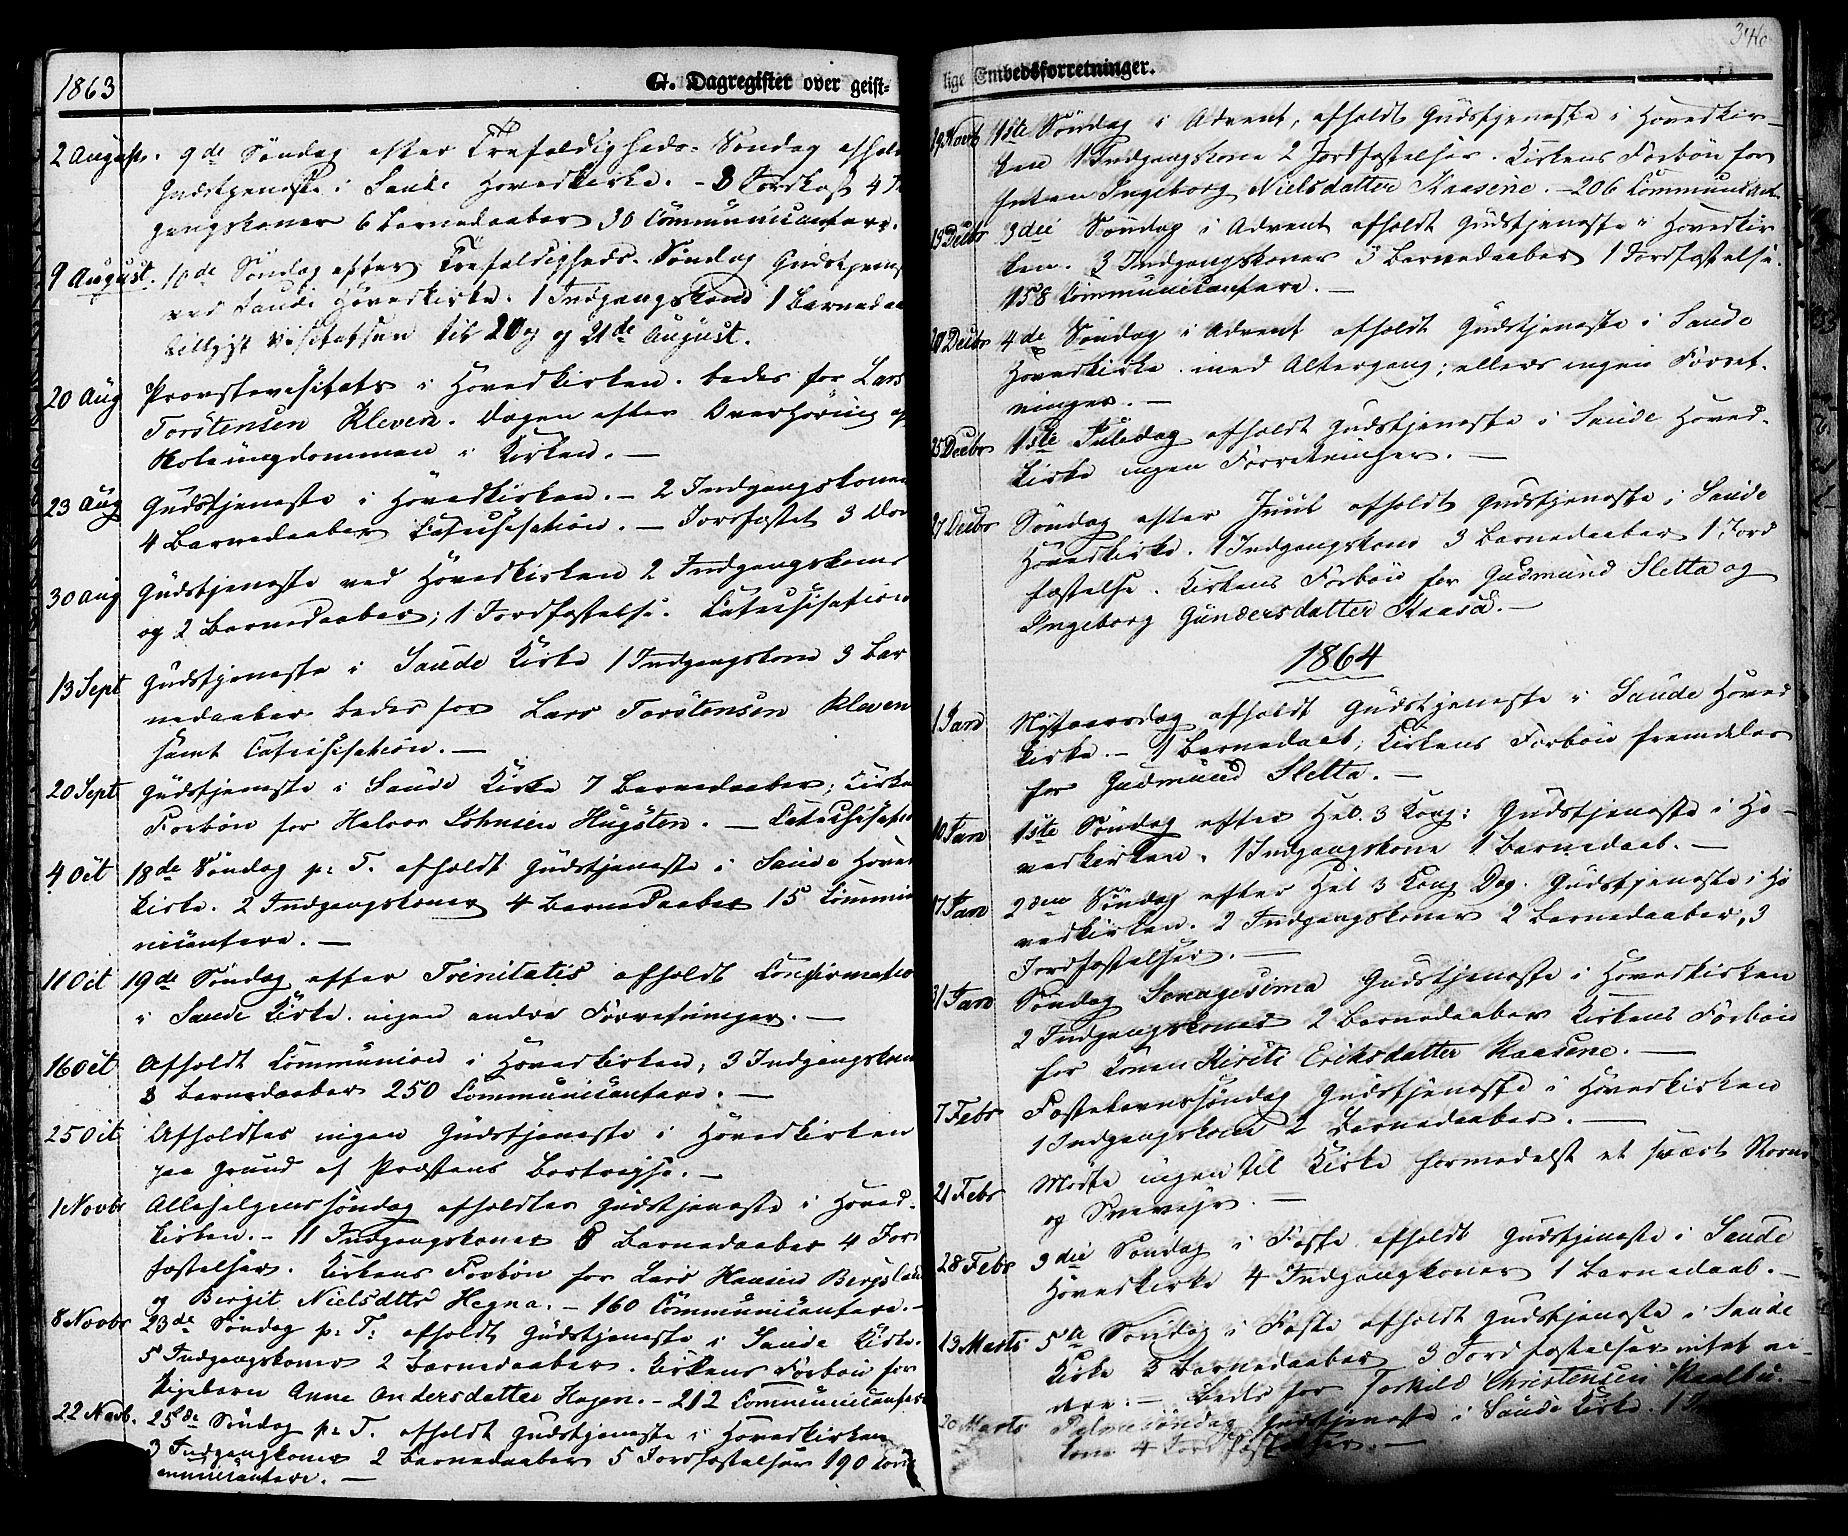 SAKO, Sauherad kirkebøker, F/Fa/L0007: Ministerialbok nr. I 7, 1851-1873, s. 346